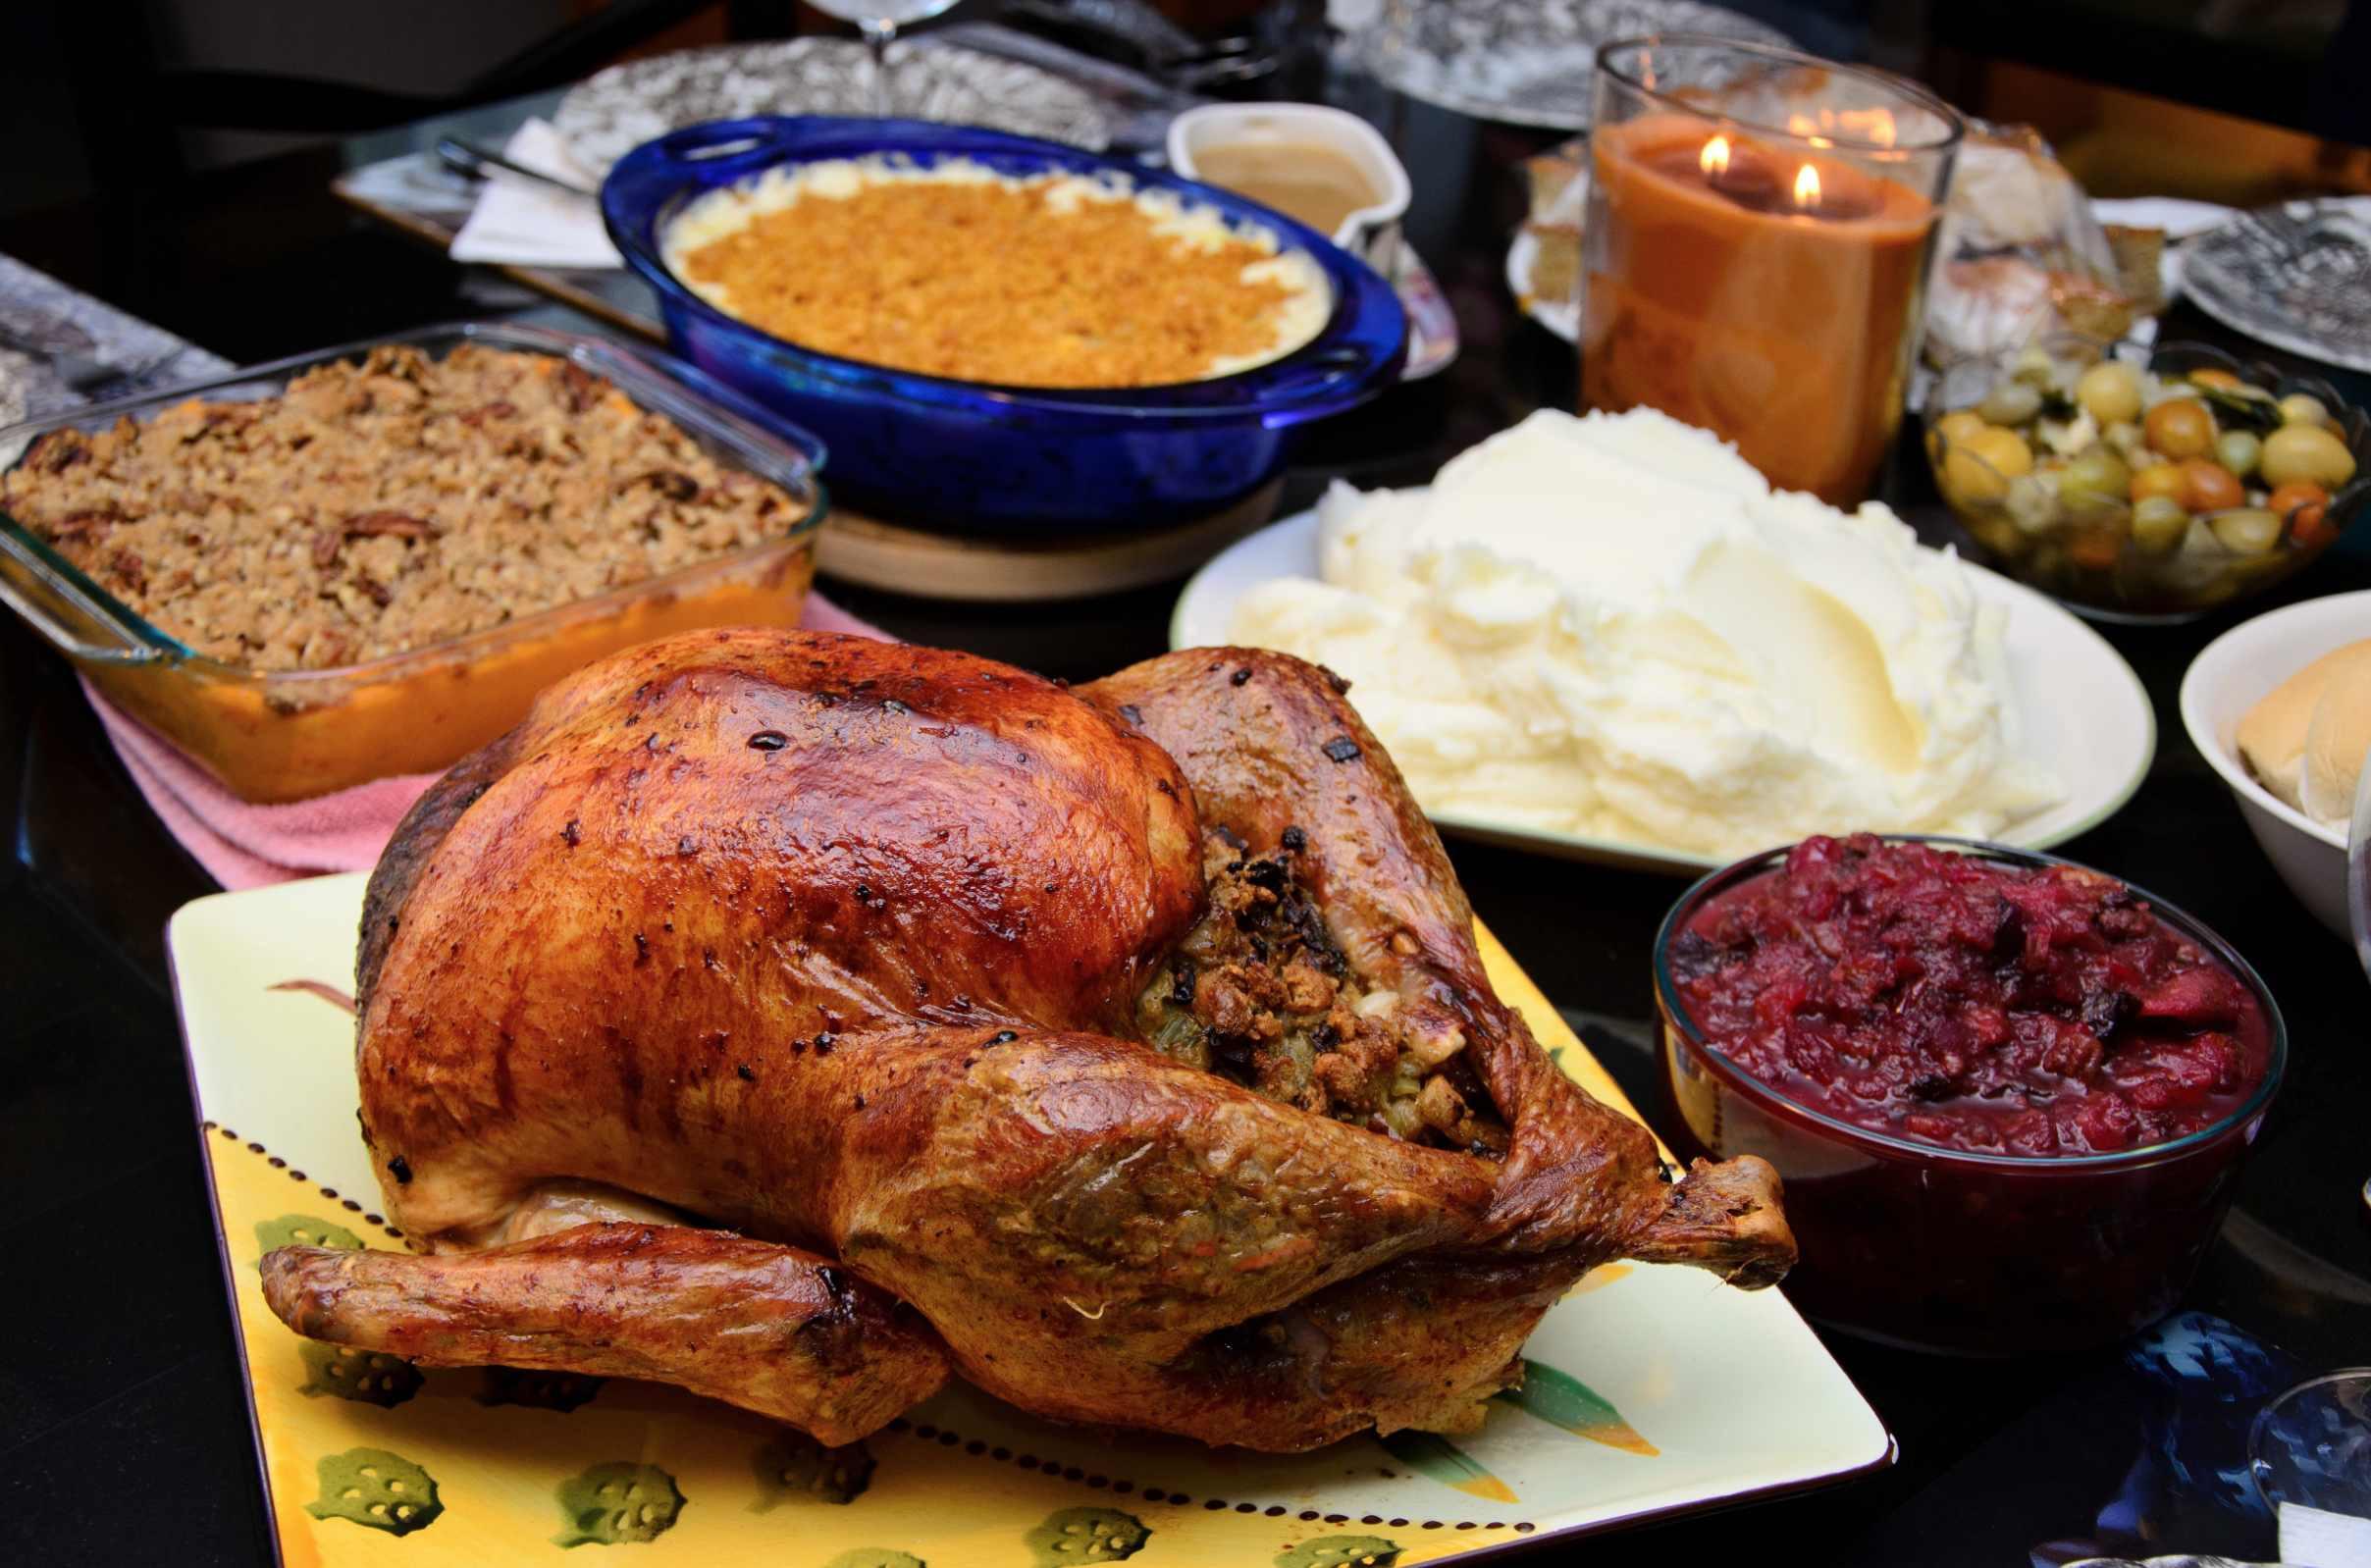 Kfc Thanksgiving Turkey  Helping families in need for Thanksgiving Burlington Record